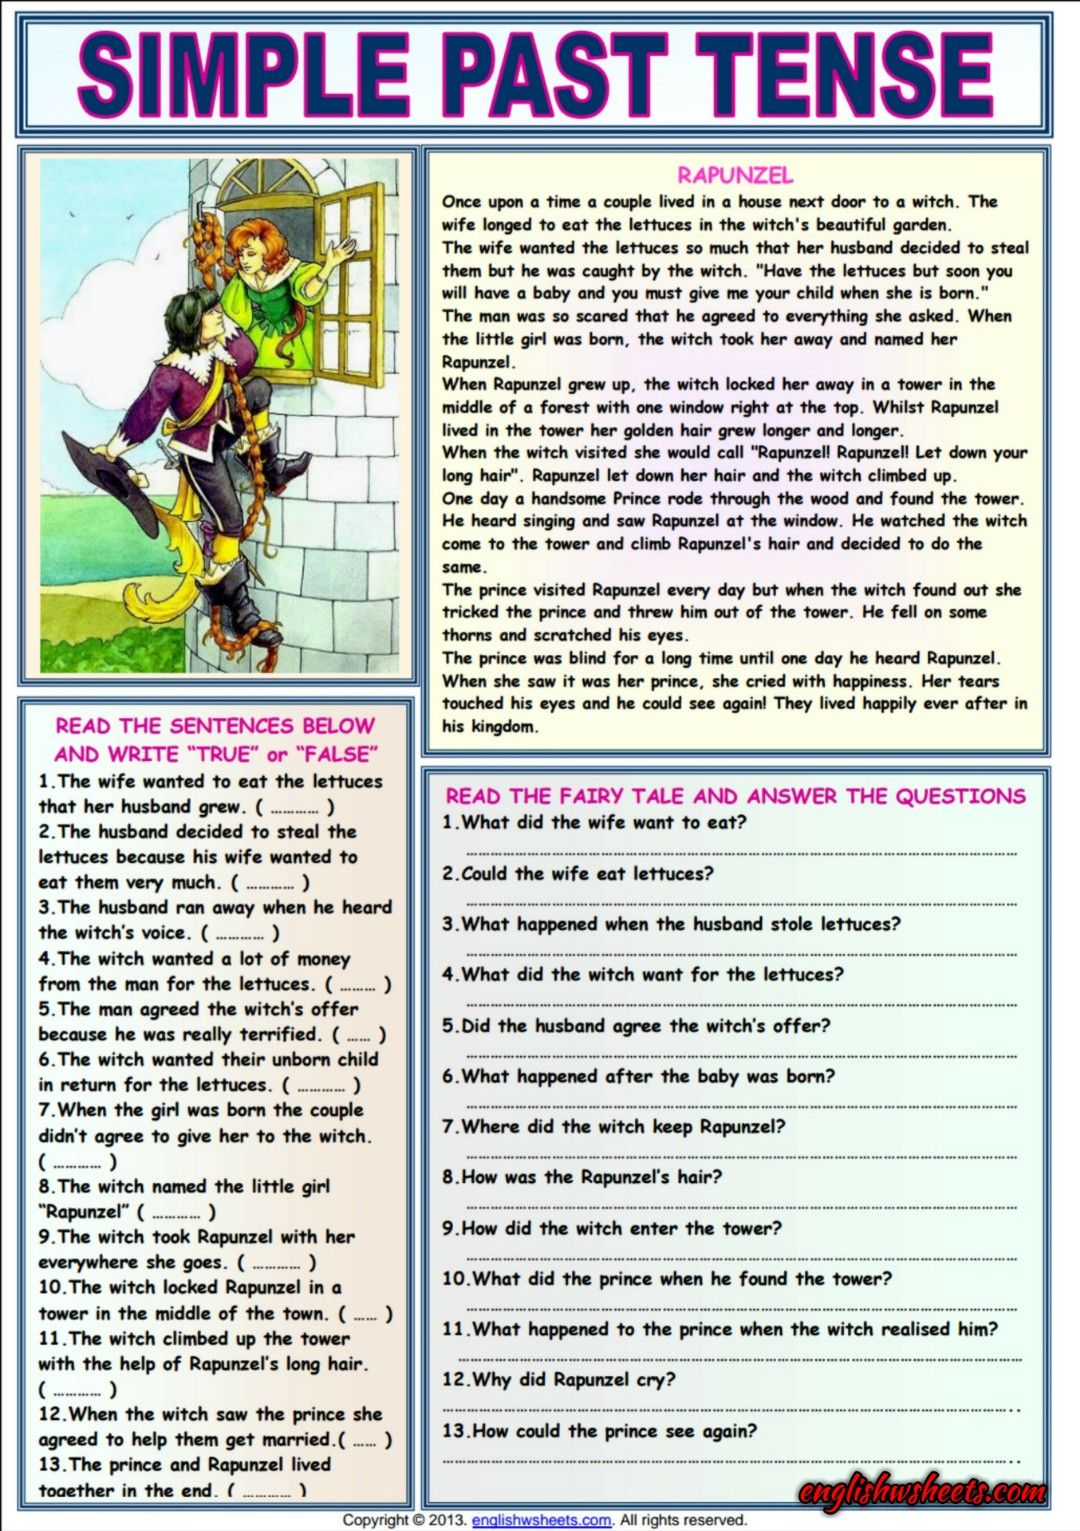 Rapunzel Comprehension Esl Exercises Worksheet Simple Past Tense Past Tense English Worksheets For Kids [ 1531 x 1080 Pixel ]